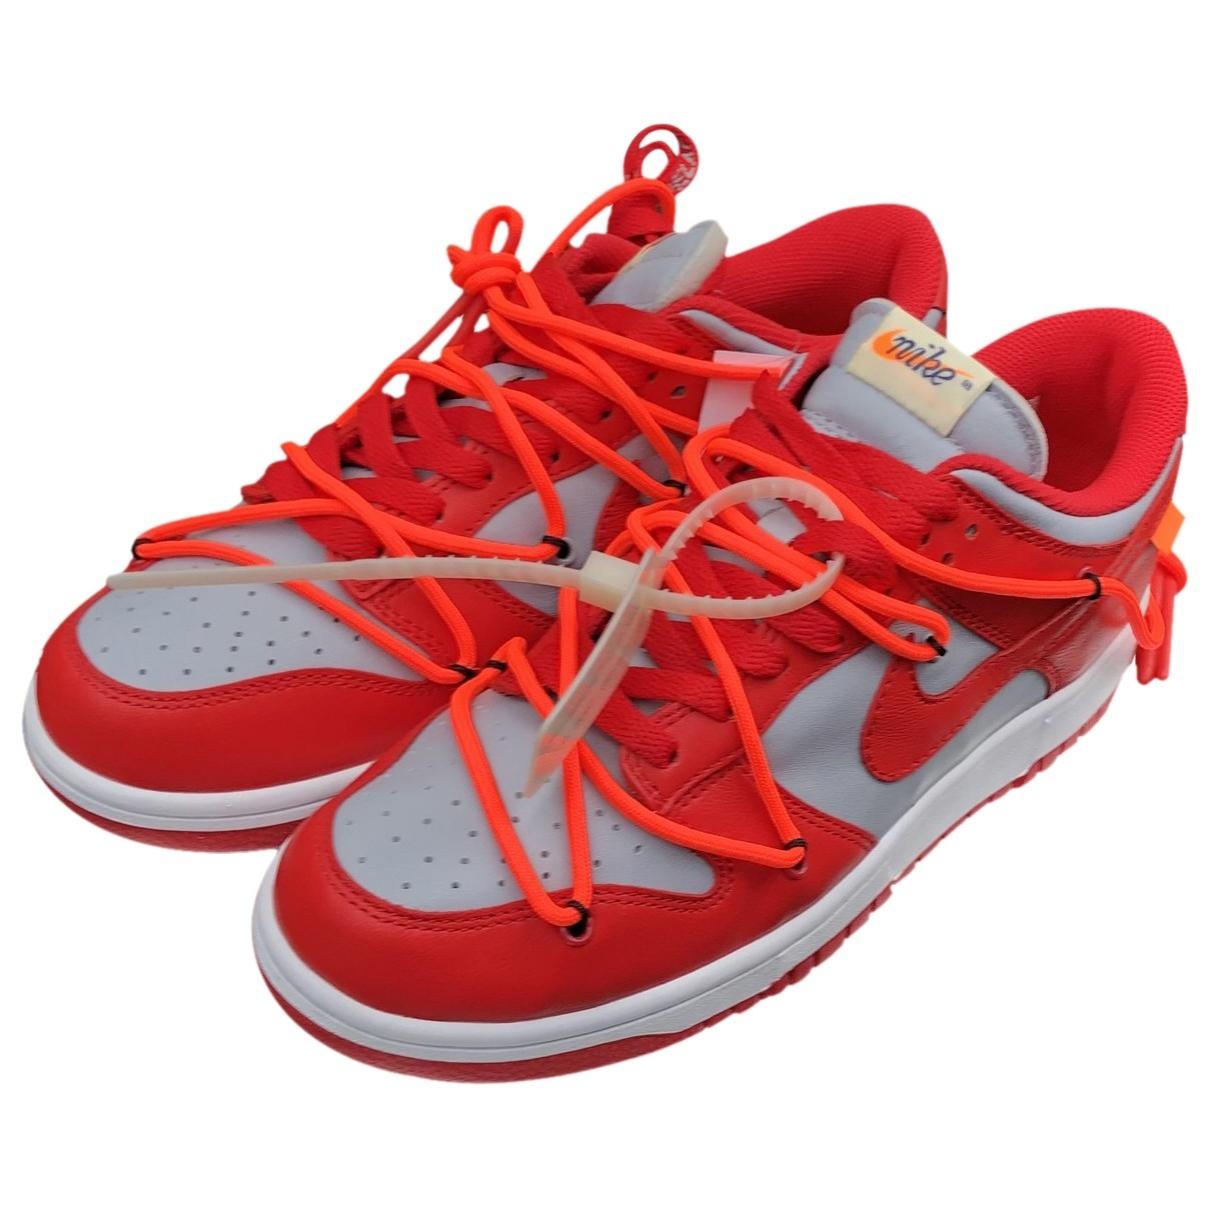 Nike X Off-white - Baskets Dunk Low pour homme en cuir - rouge